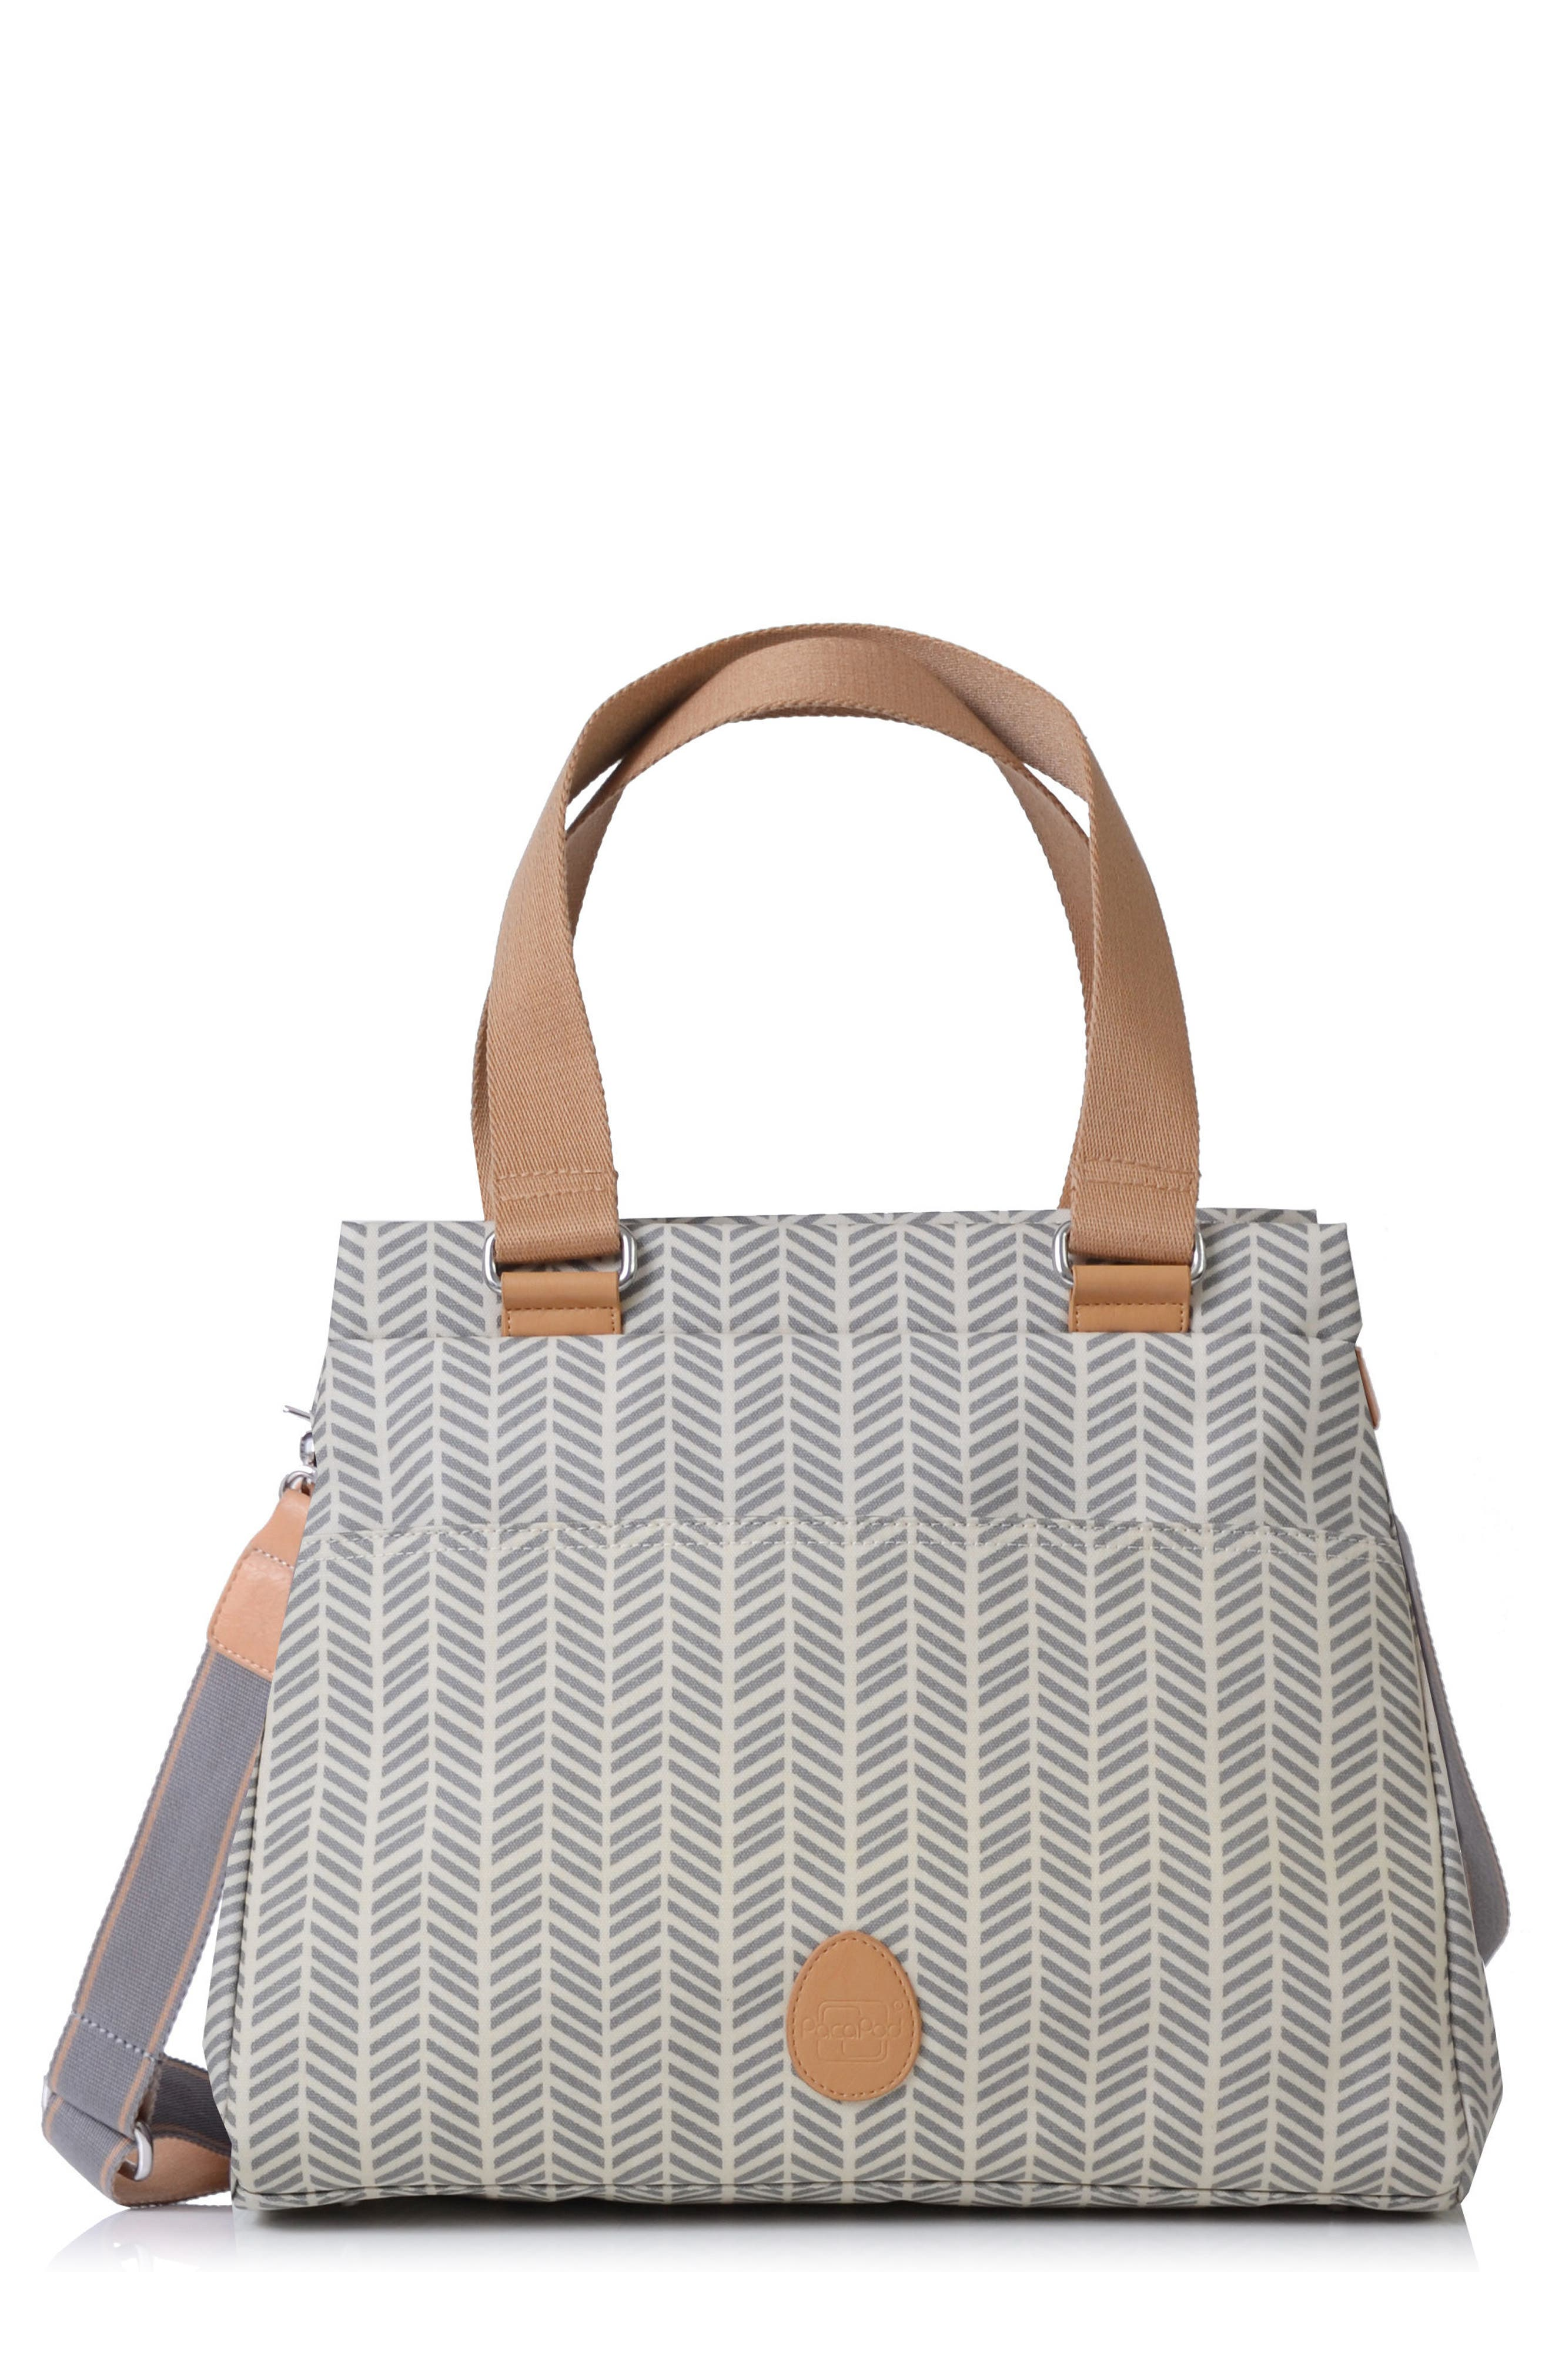 PacaPod 'Richmond' Diaper Bag